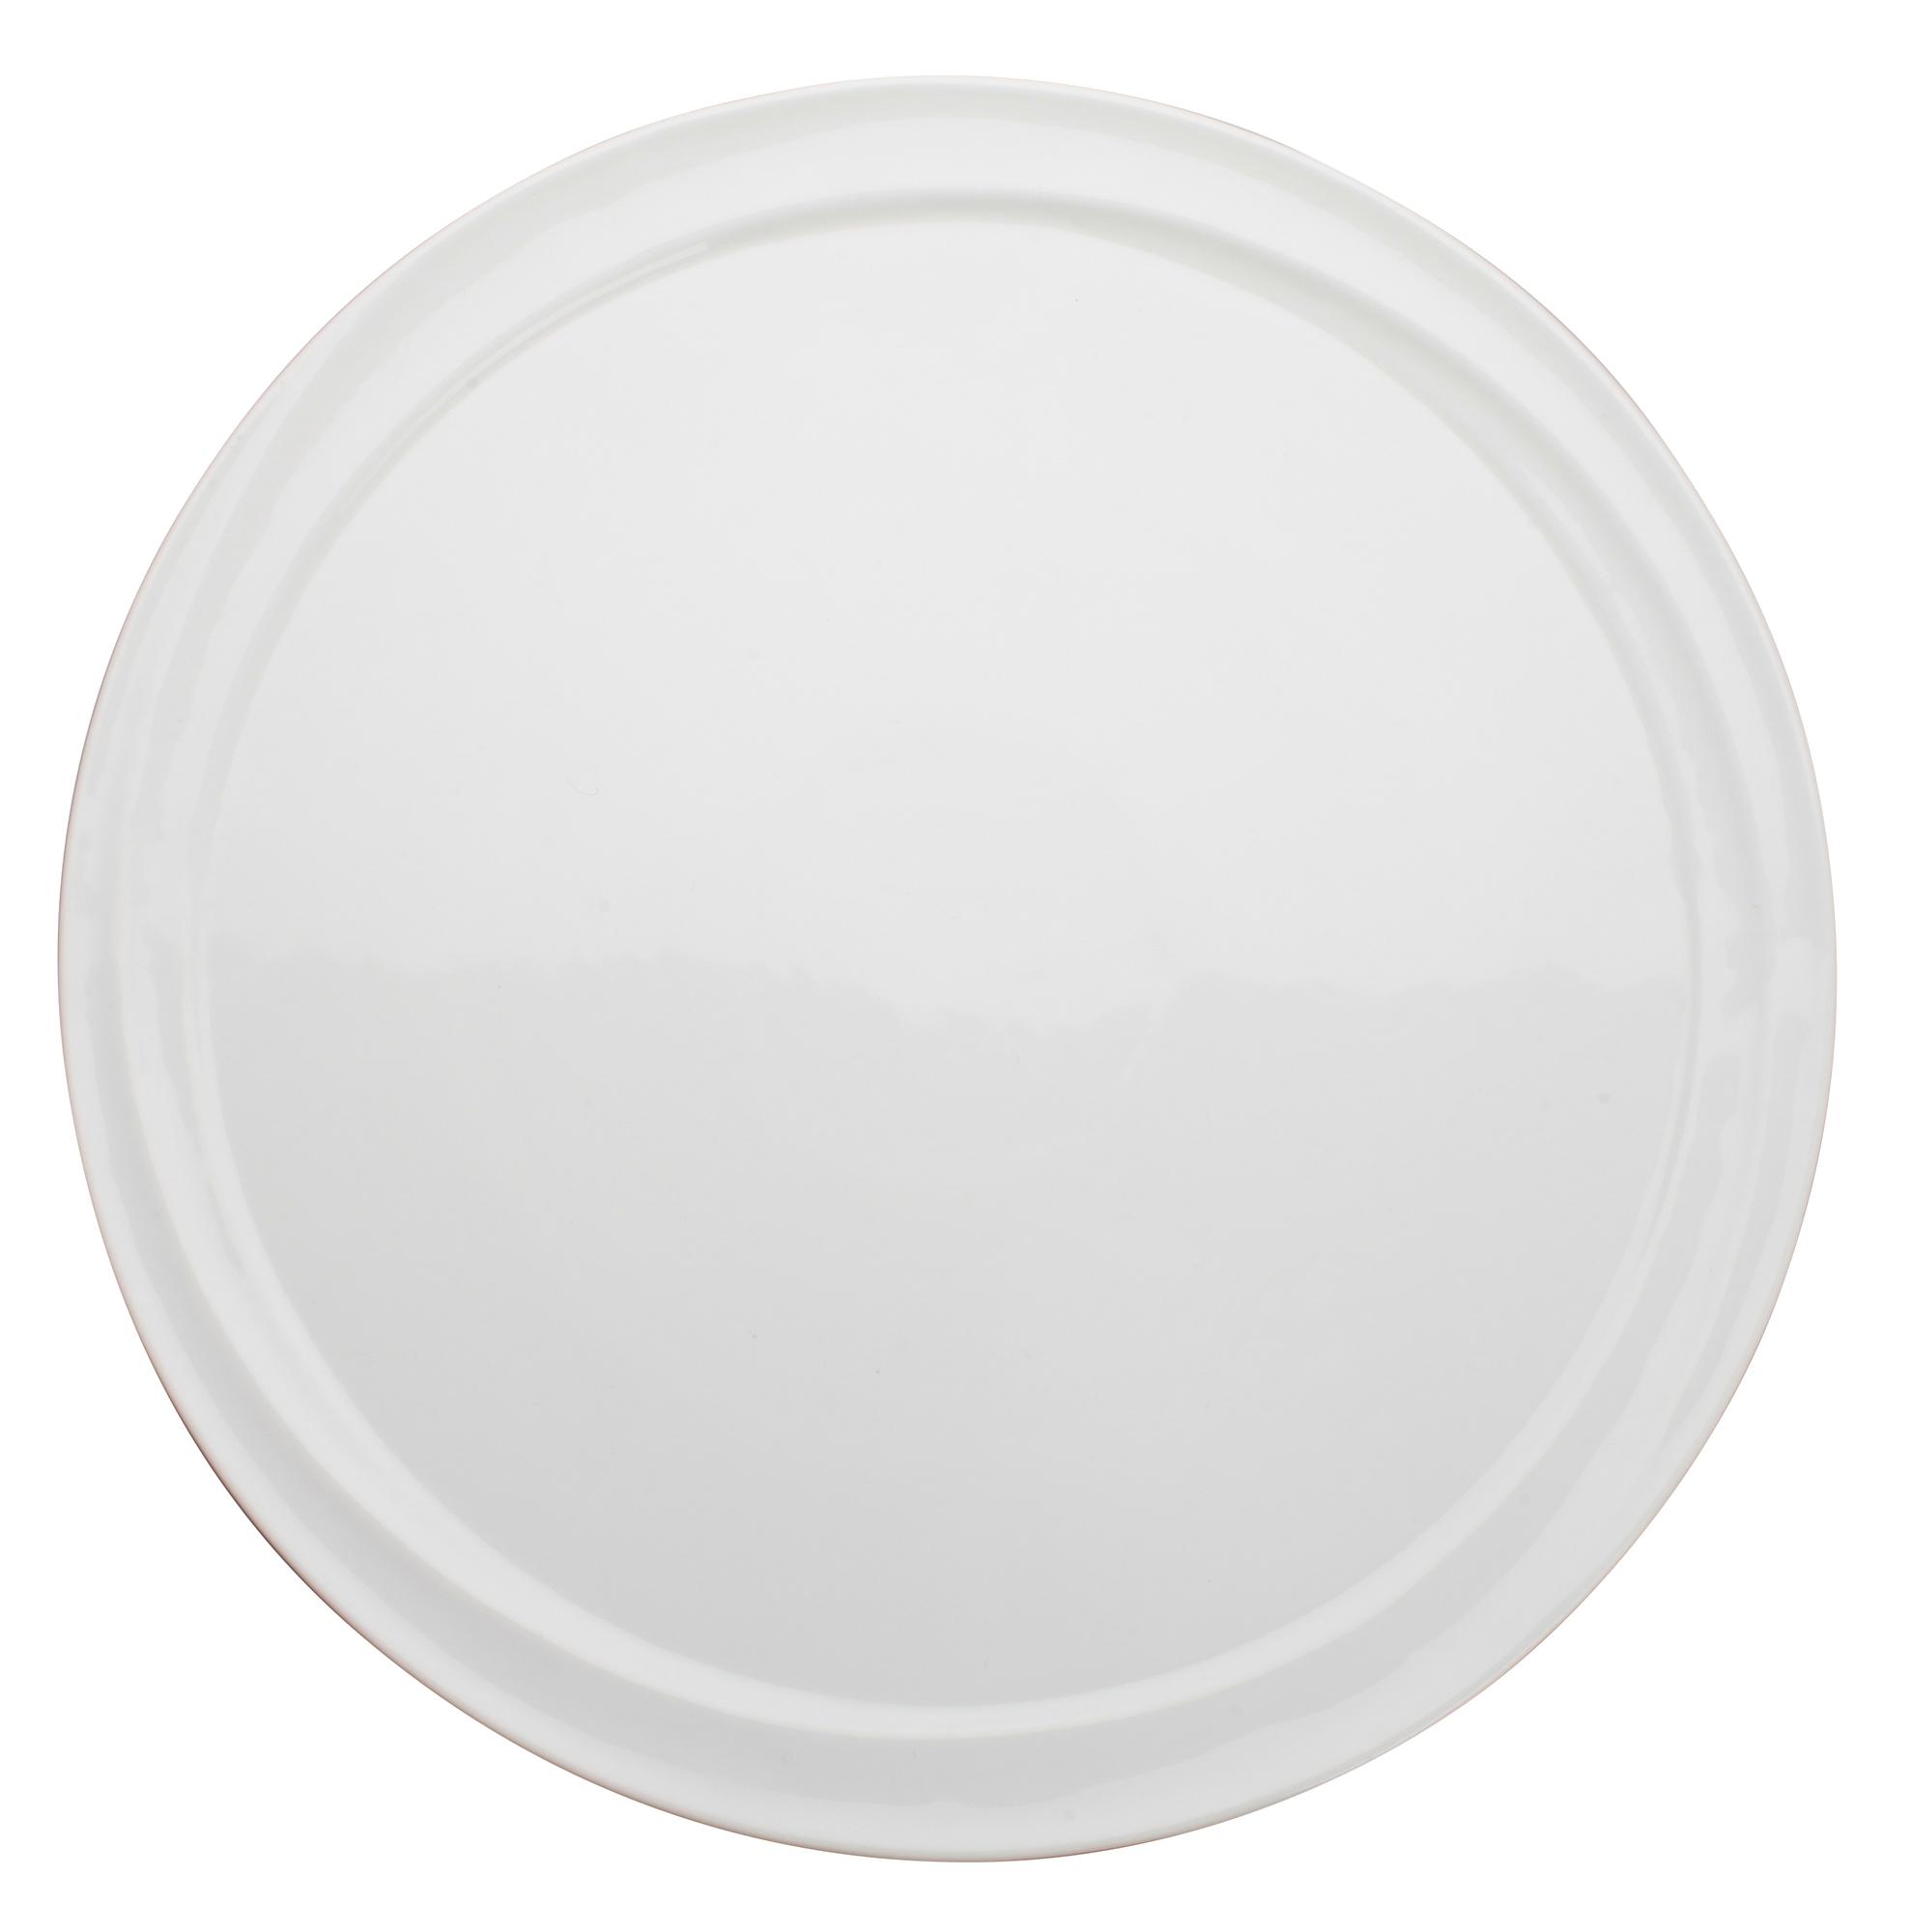 Winco WDP007-101 plate, china